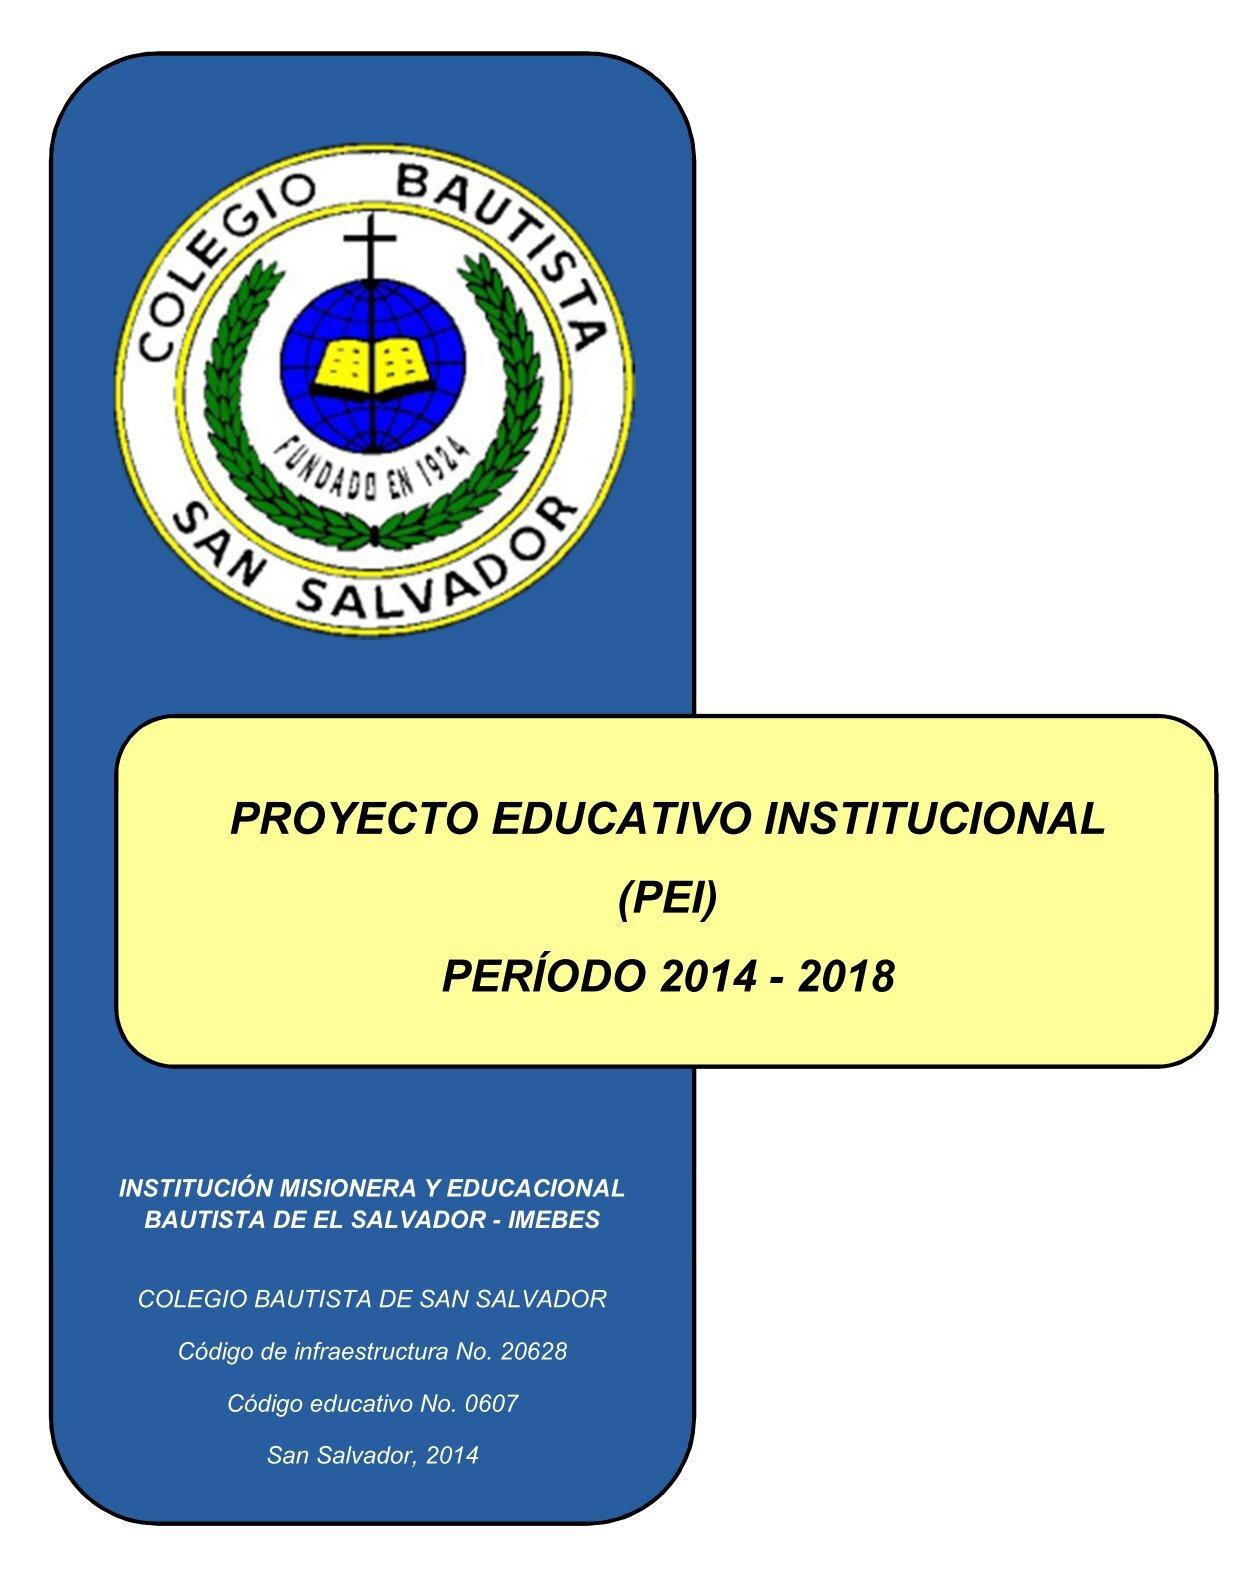 PROYECTO EDUCATIVO INSTITUCIONAL (PEI) PERÍODO 2014 - 2018